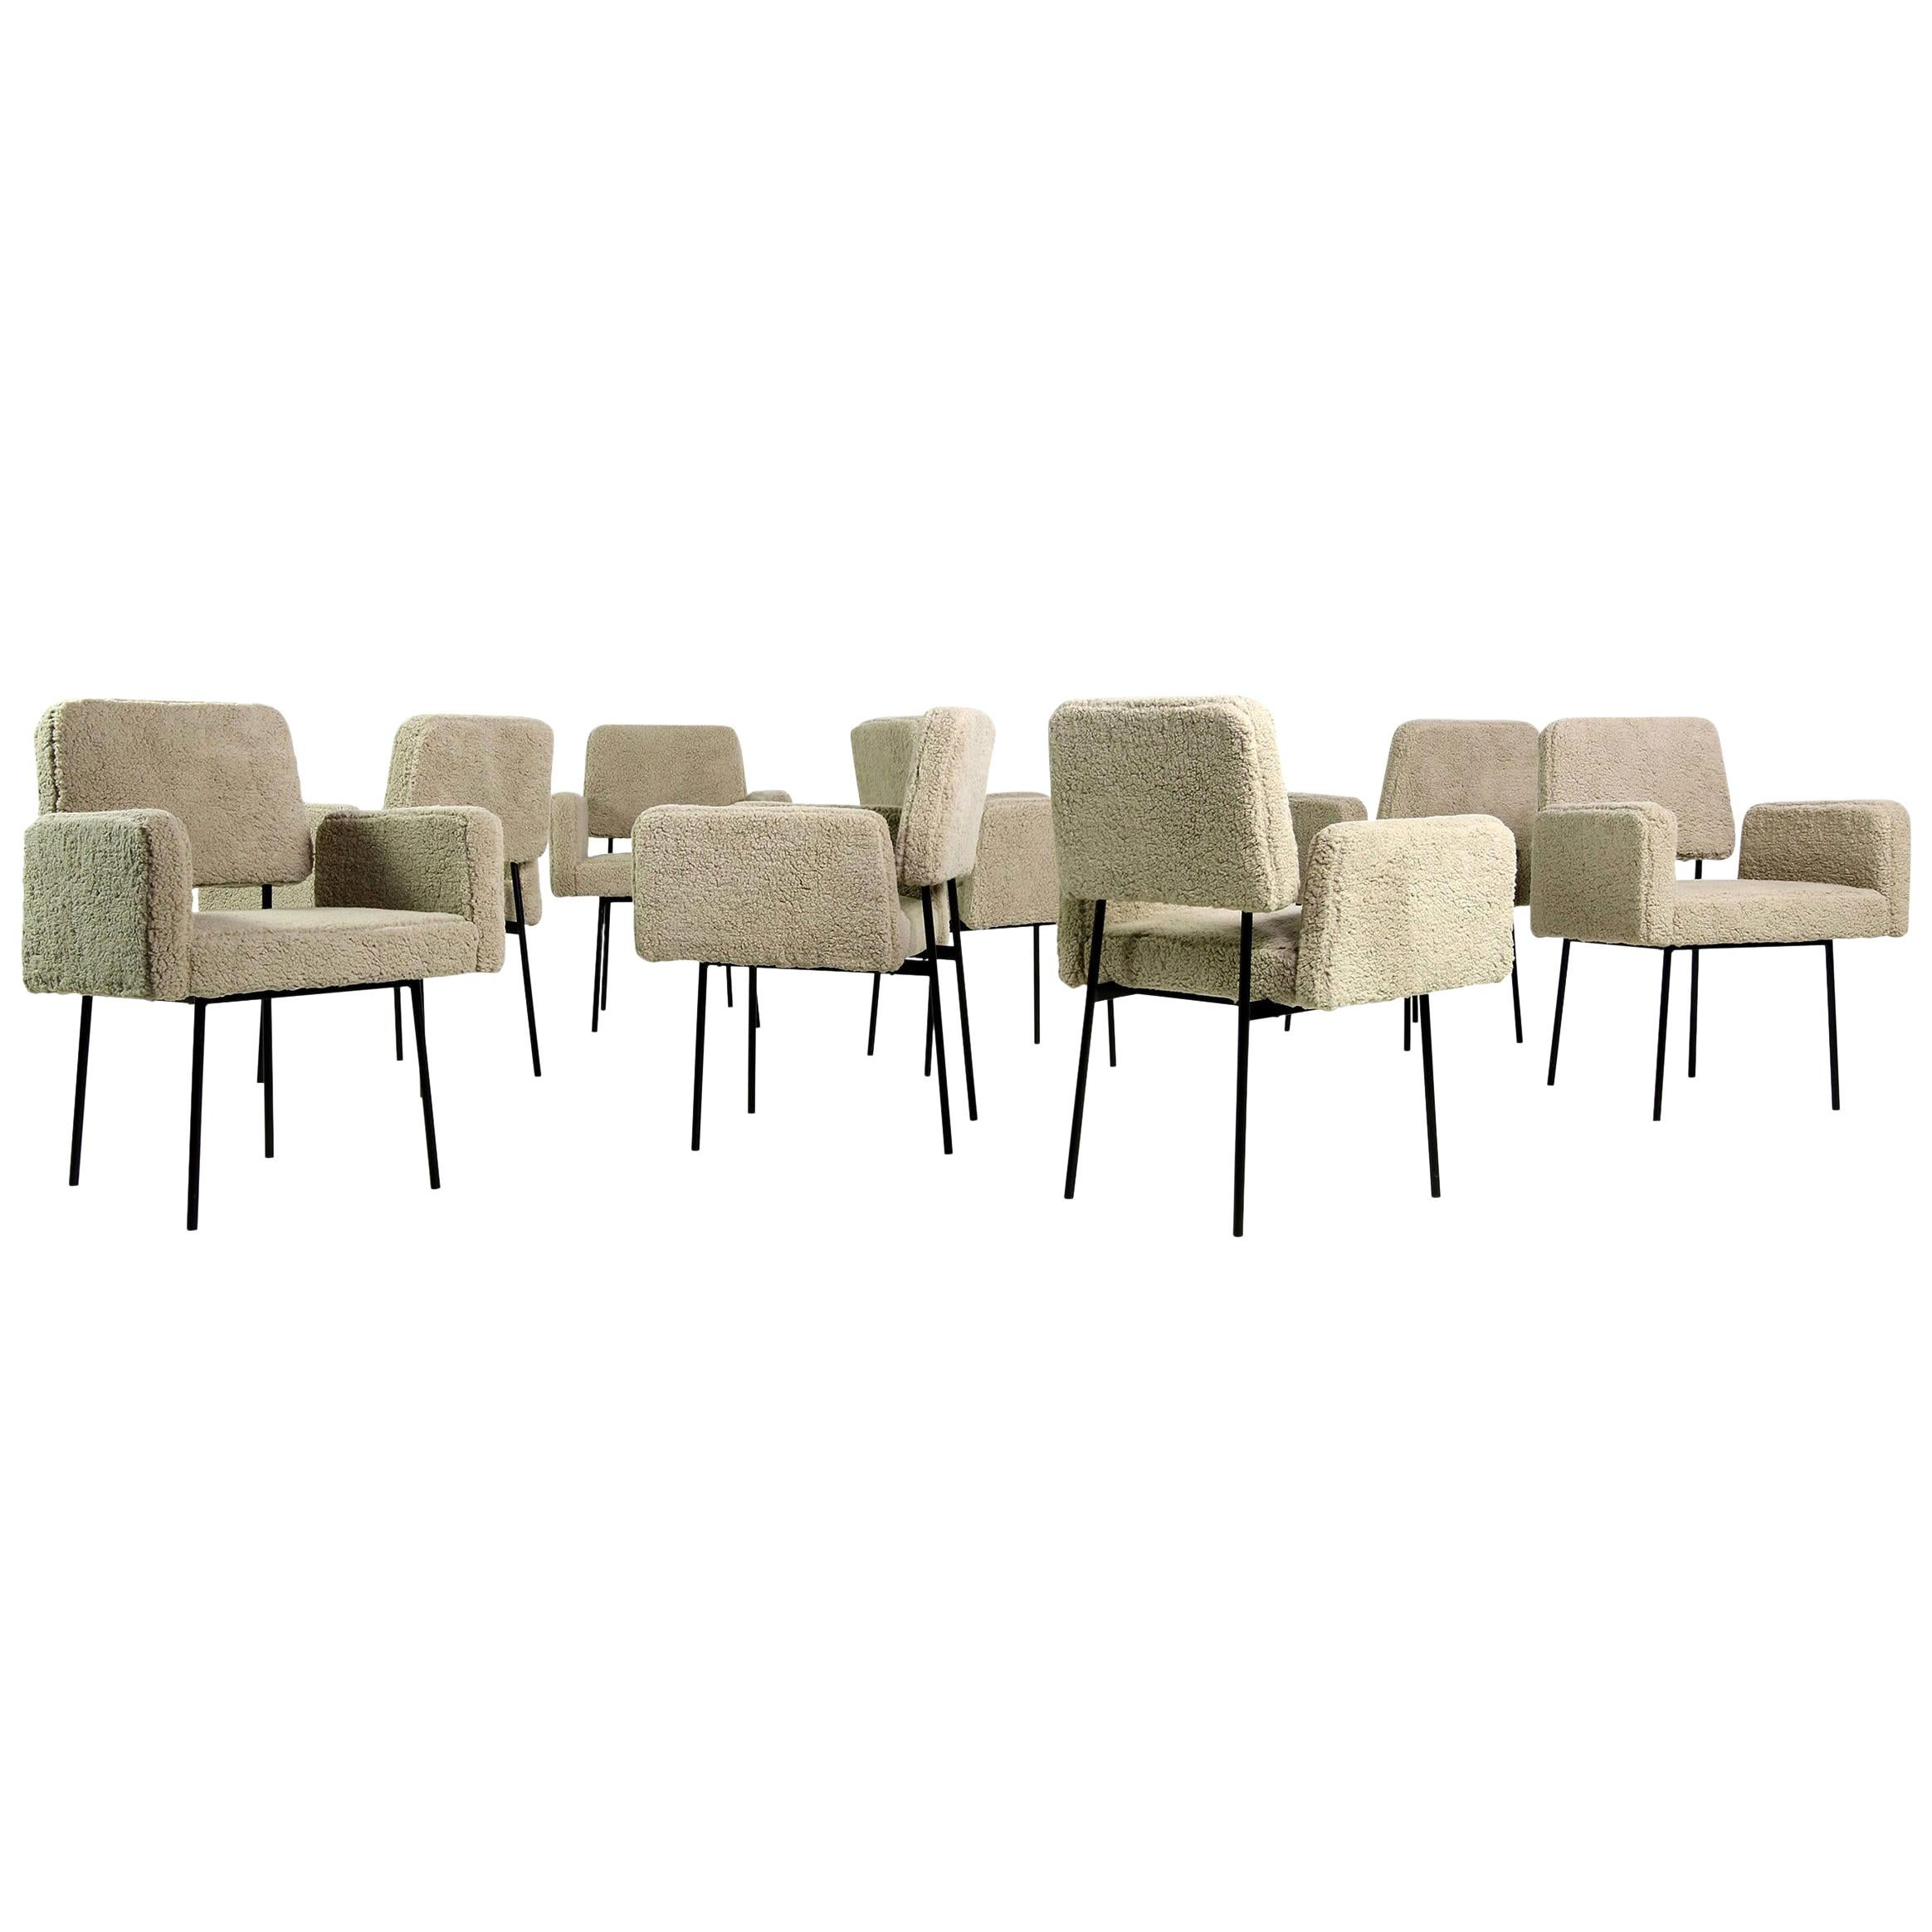 1 of 12 Dining Room Chairs, Armchair Nathan Lindberg Teddy Fur, Metal, Sheepskin